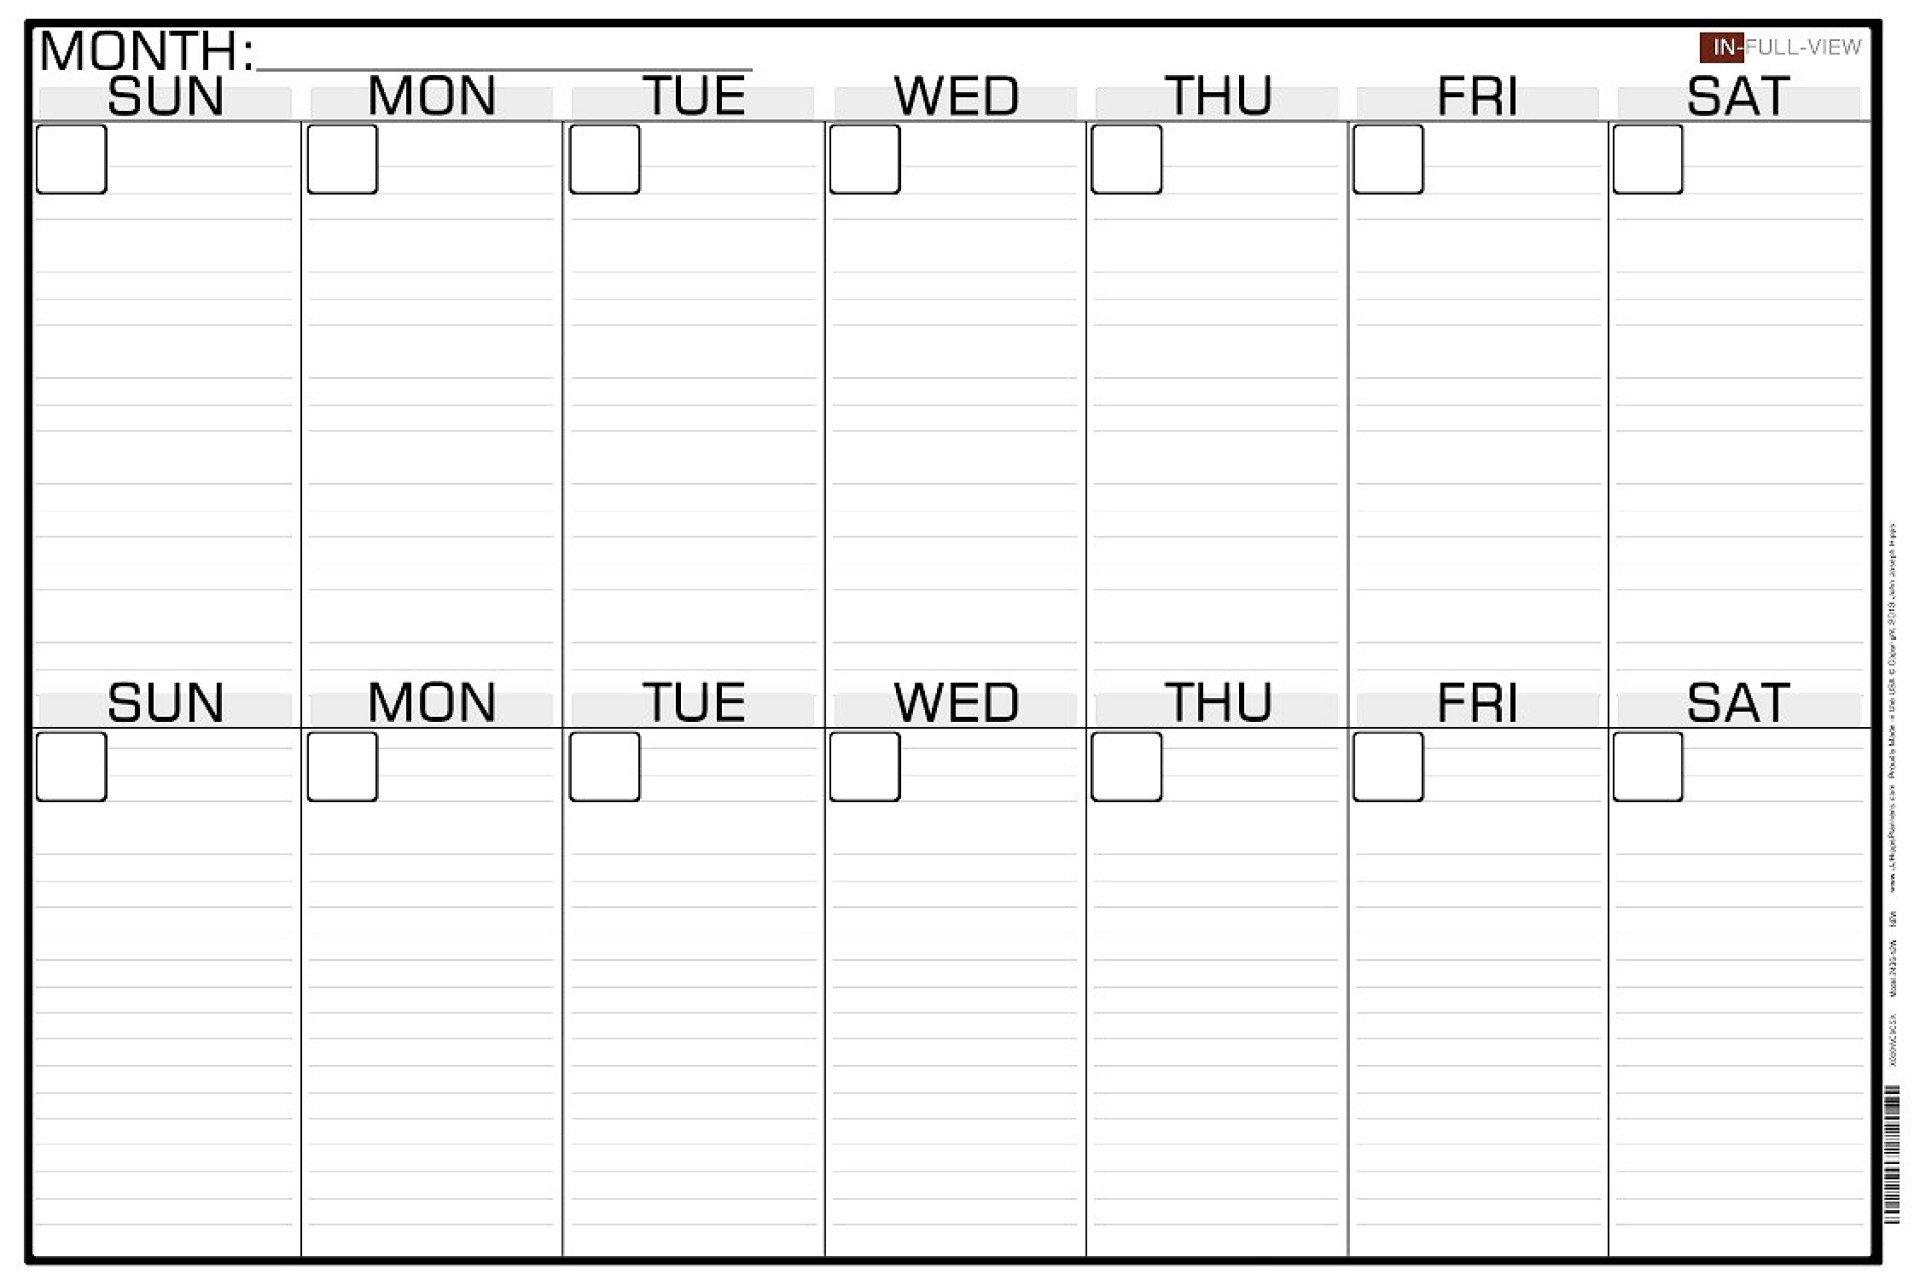 Monday To Friday 2 Week Calendar Template | Example Two Week Calendar Template